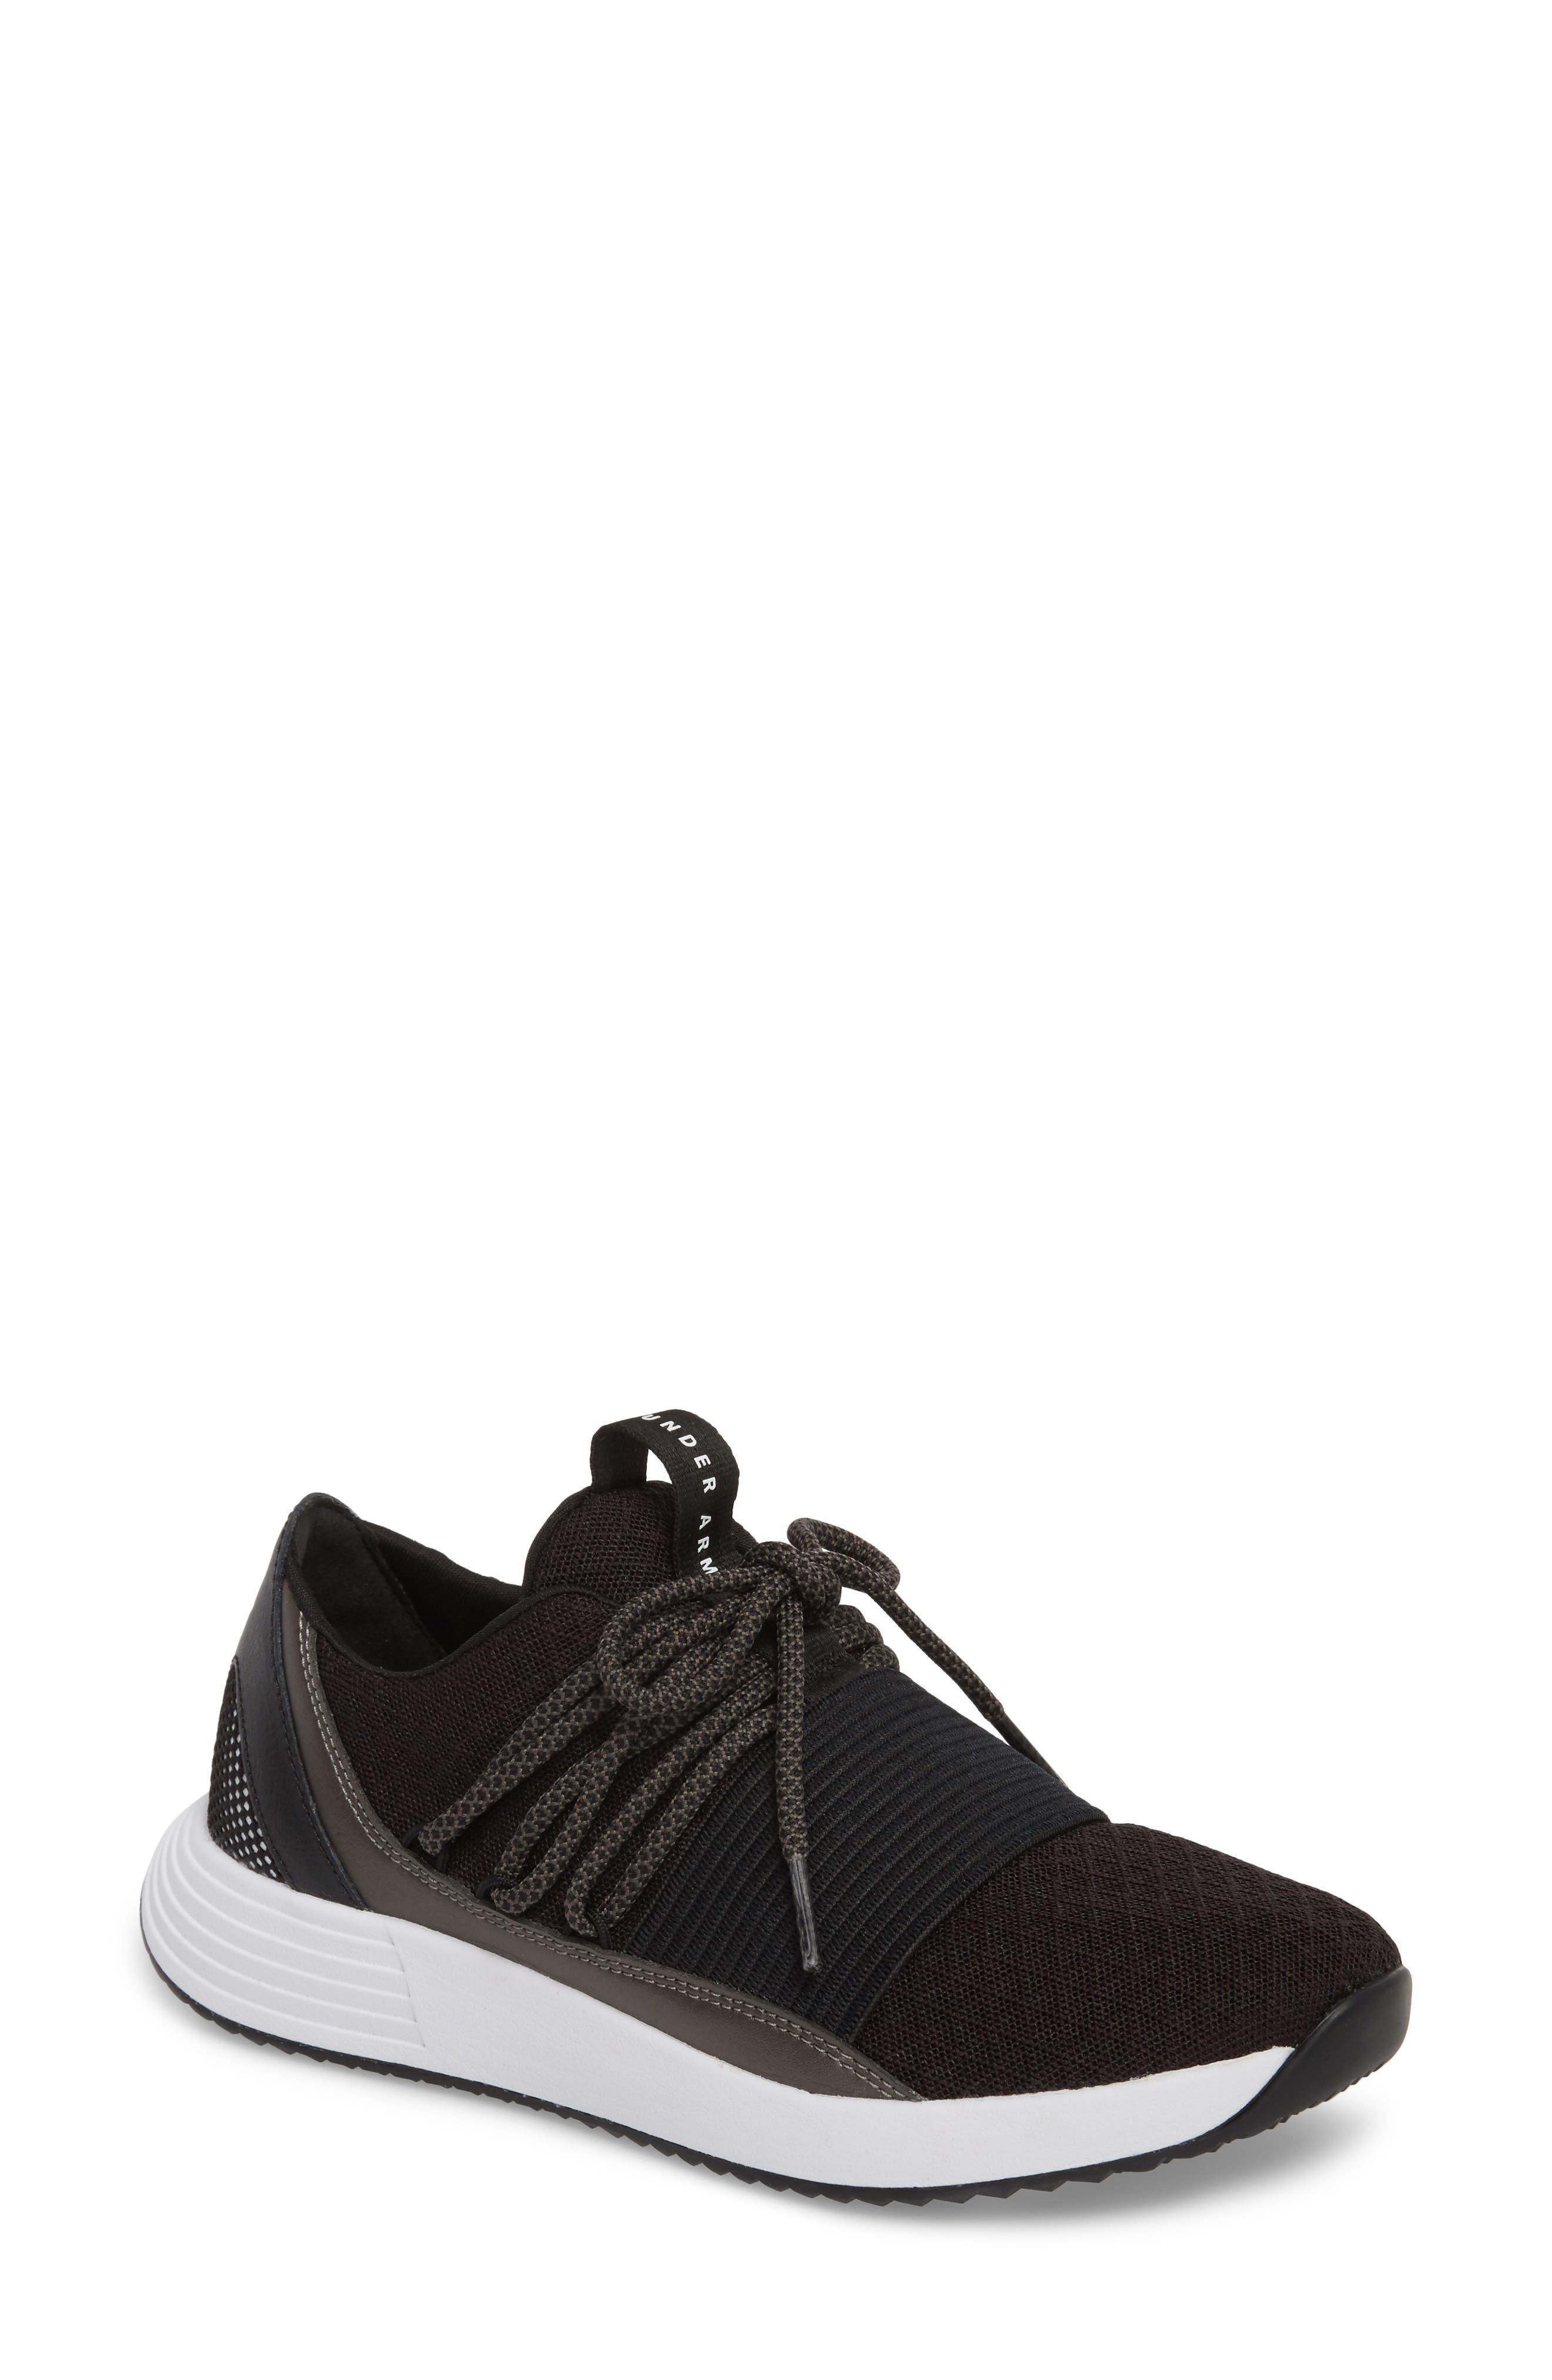 Breathe Low Top Sneaker,                         Main,                         color, 001